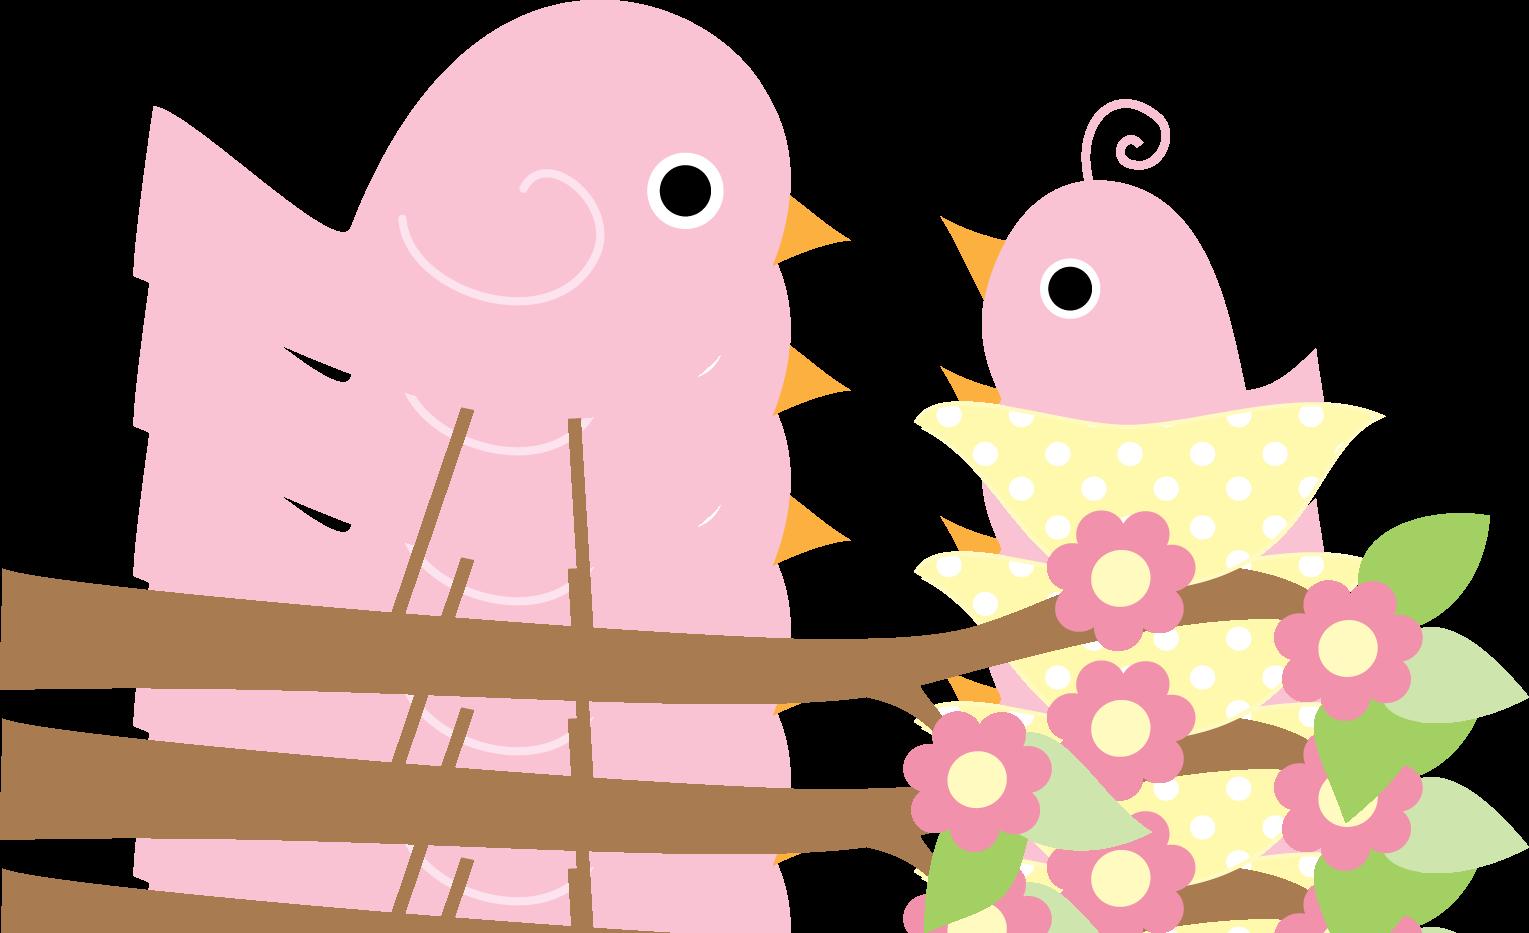 Pinkbirdsonbranch Png Pajaritos Pajaros Mantas De Puntos